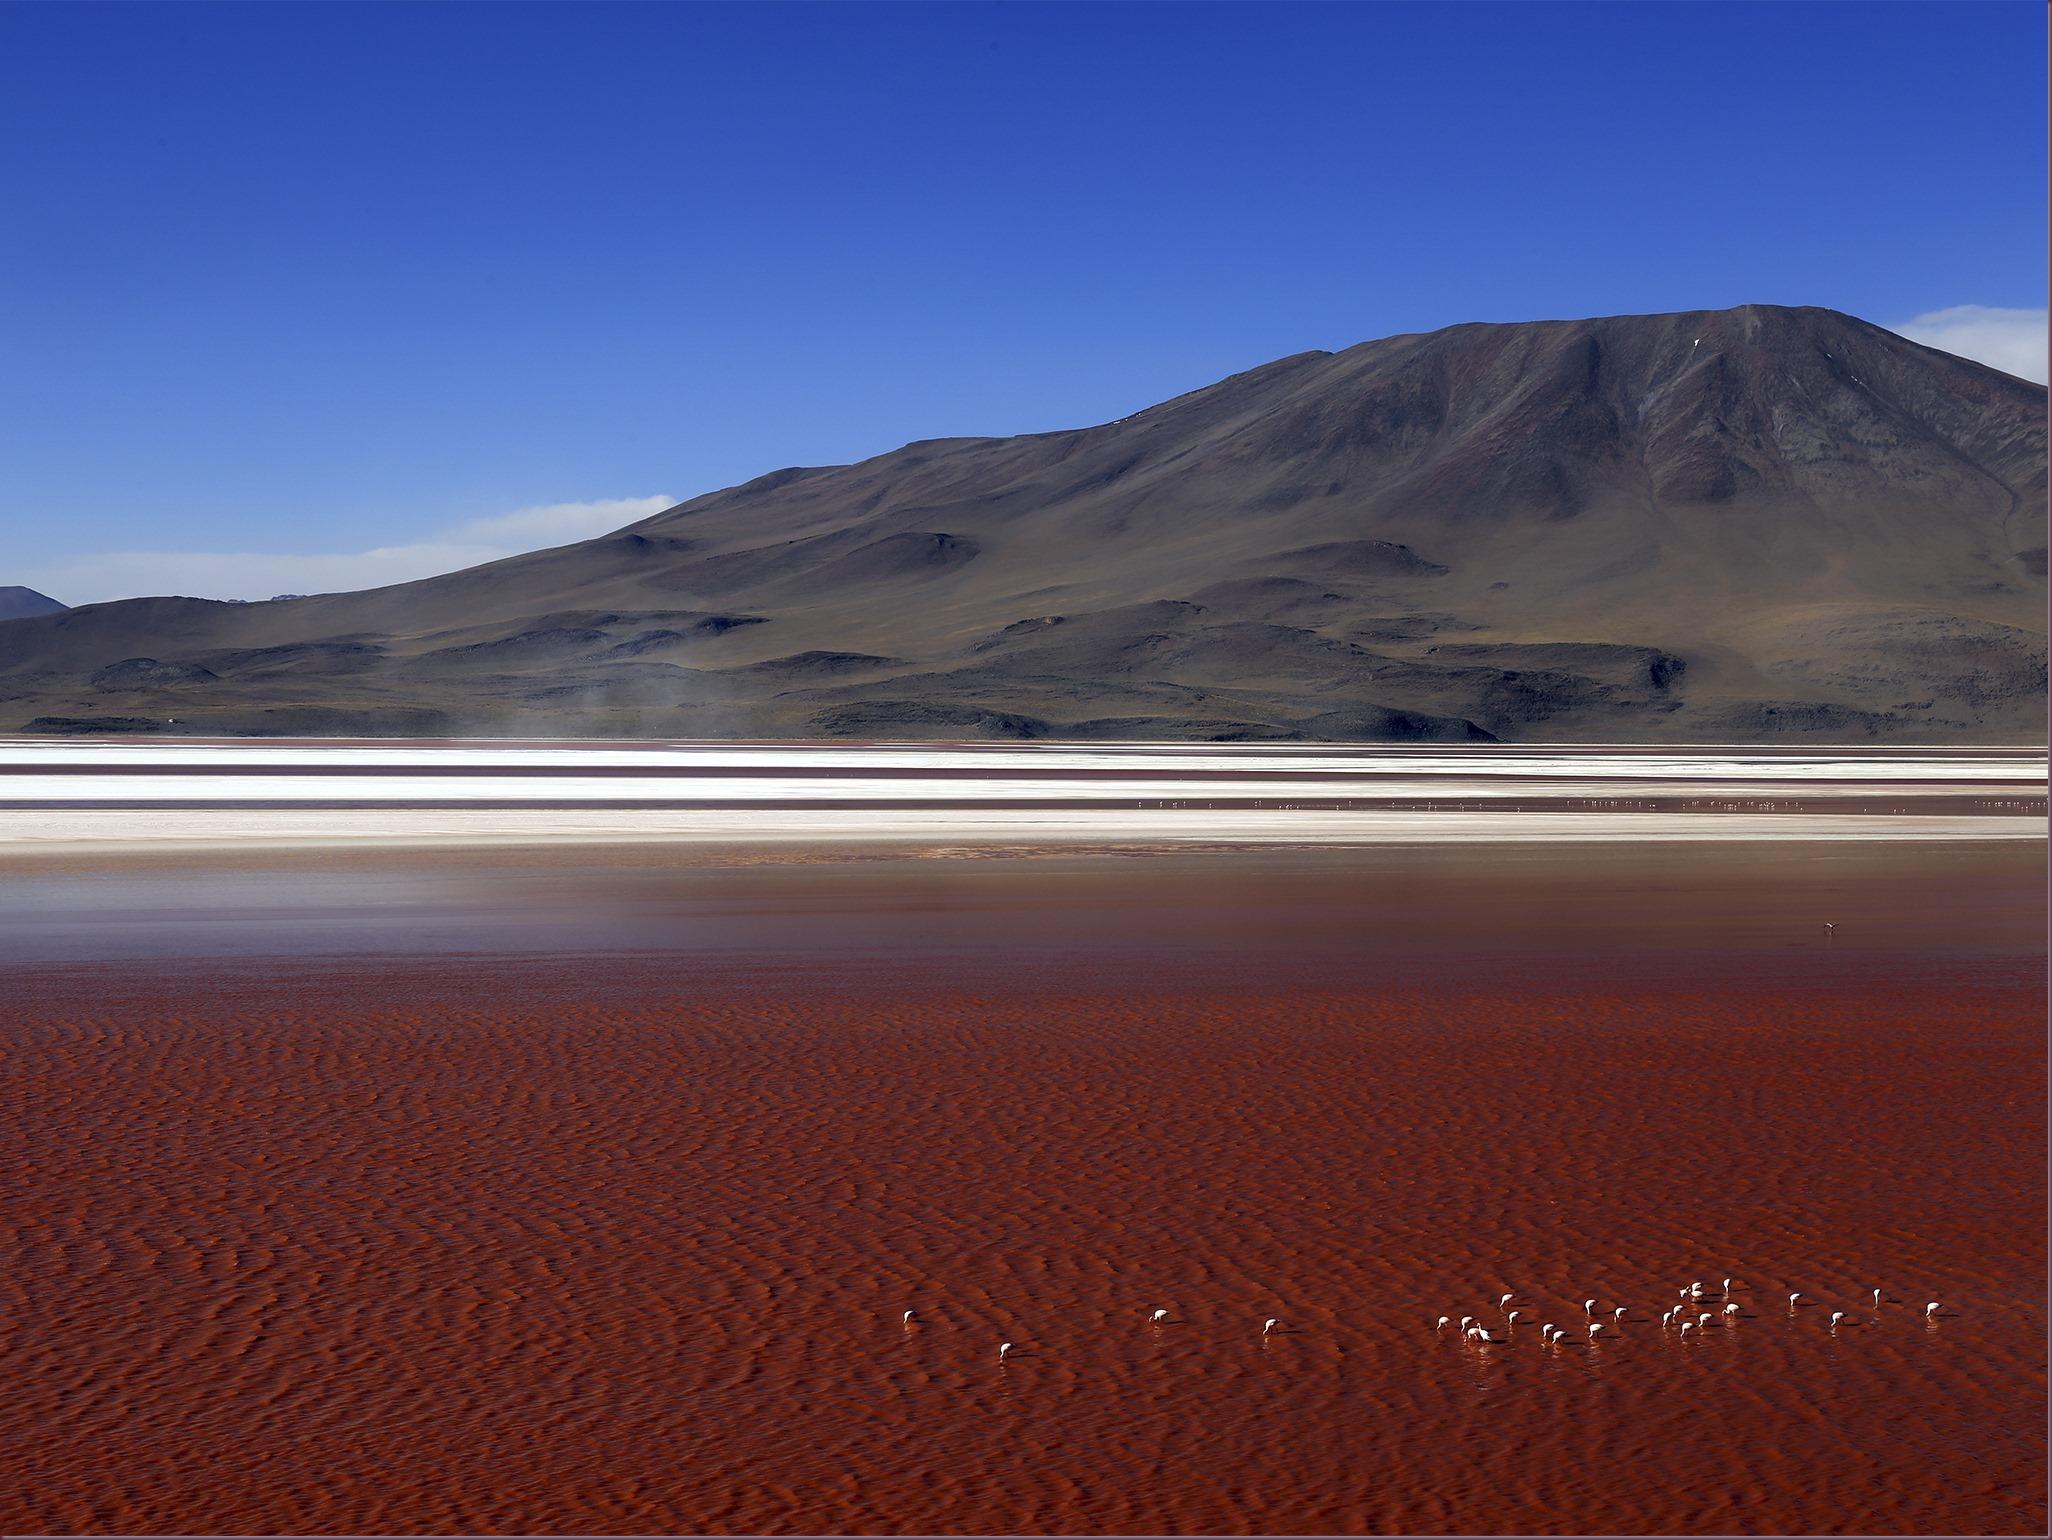 laguna-colorada-bolivia-c